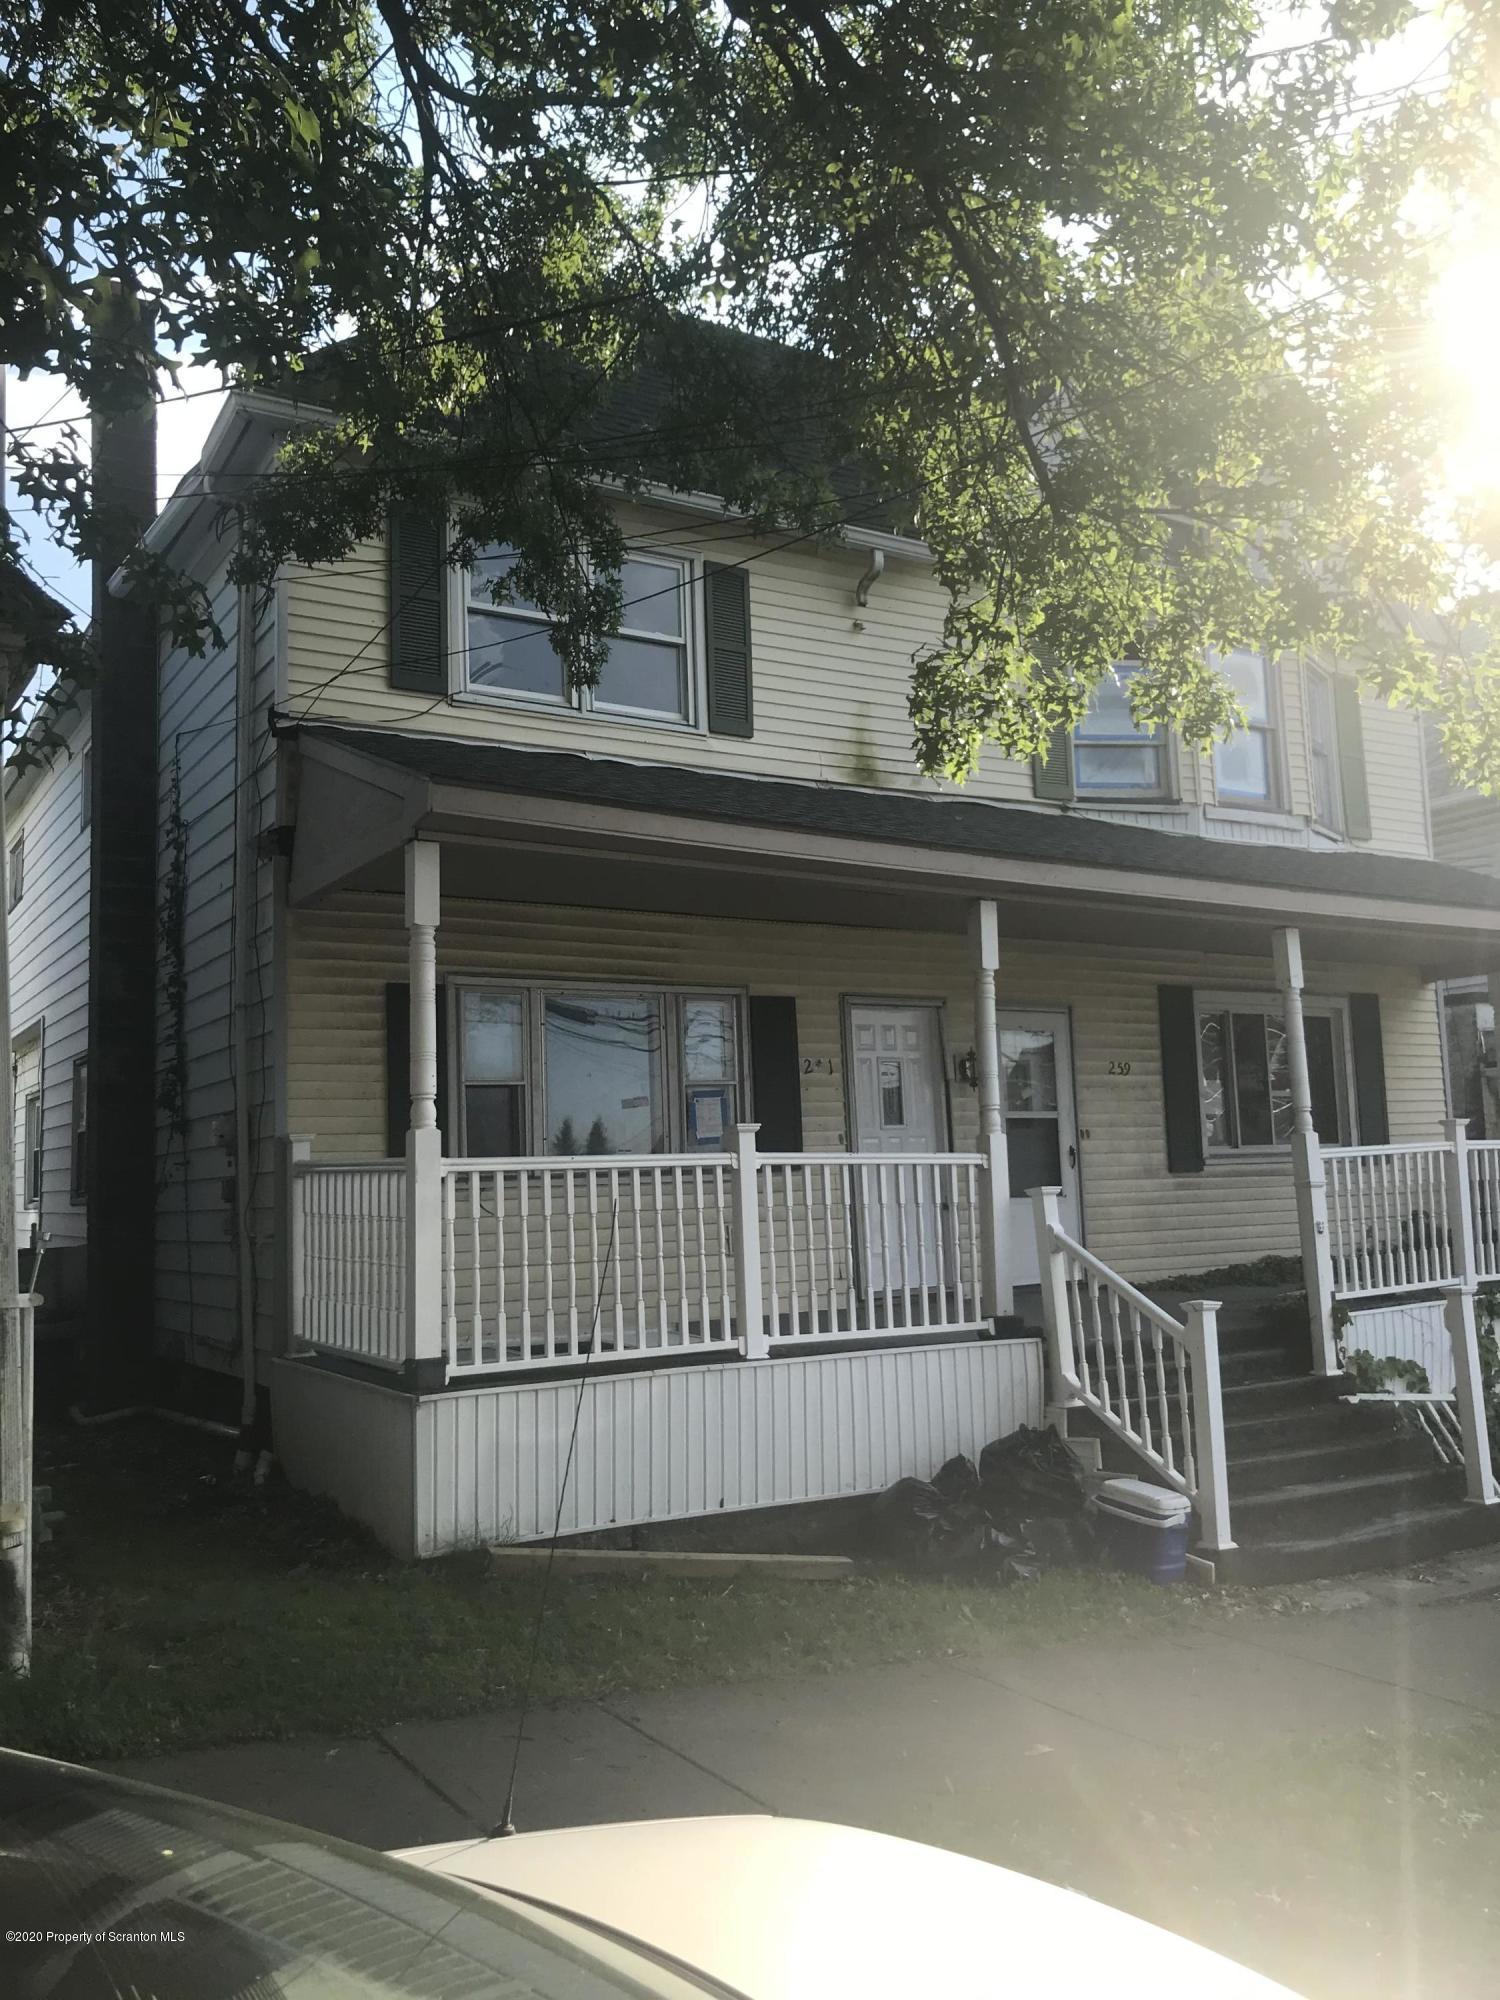 261 Dana St, Wilkes-Barre, Pennsylvania 18702, 3 Bedrooms Bedrooms, 7 Rooms Rooms,2 BathroomsBathrooms,Rental,For Lease,Dana,20-2235